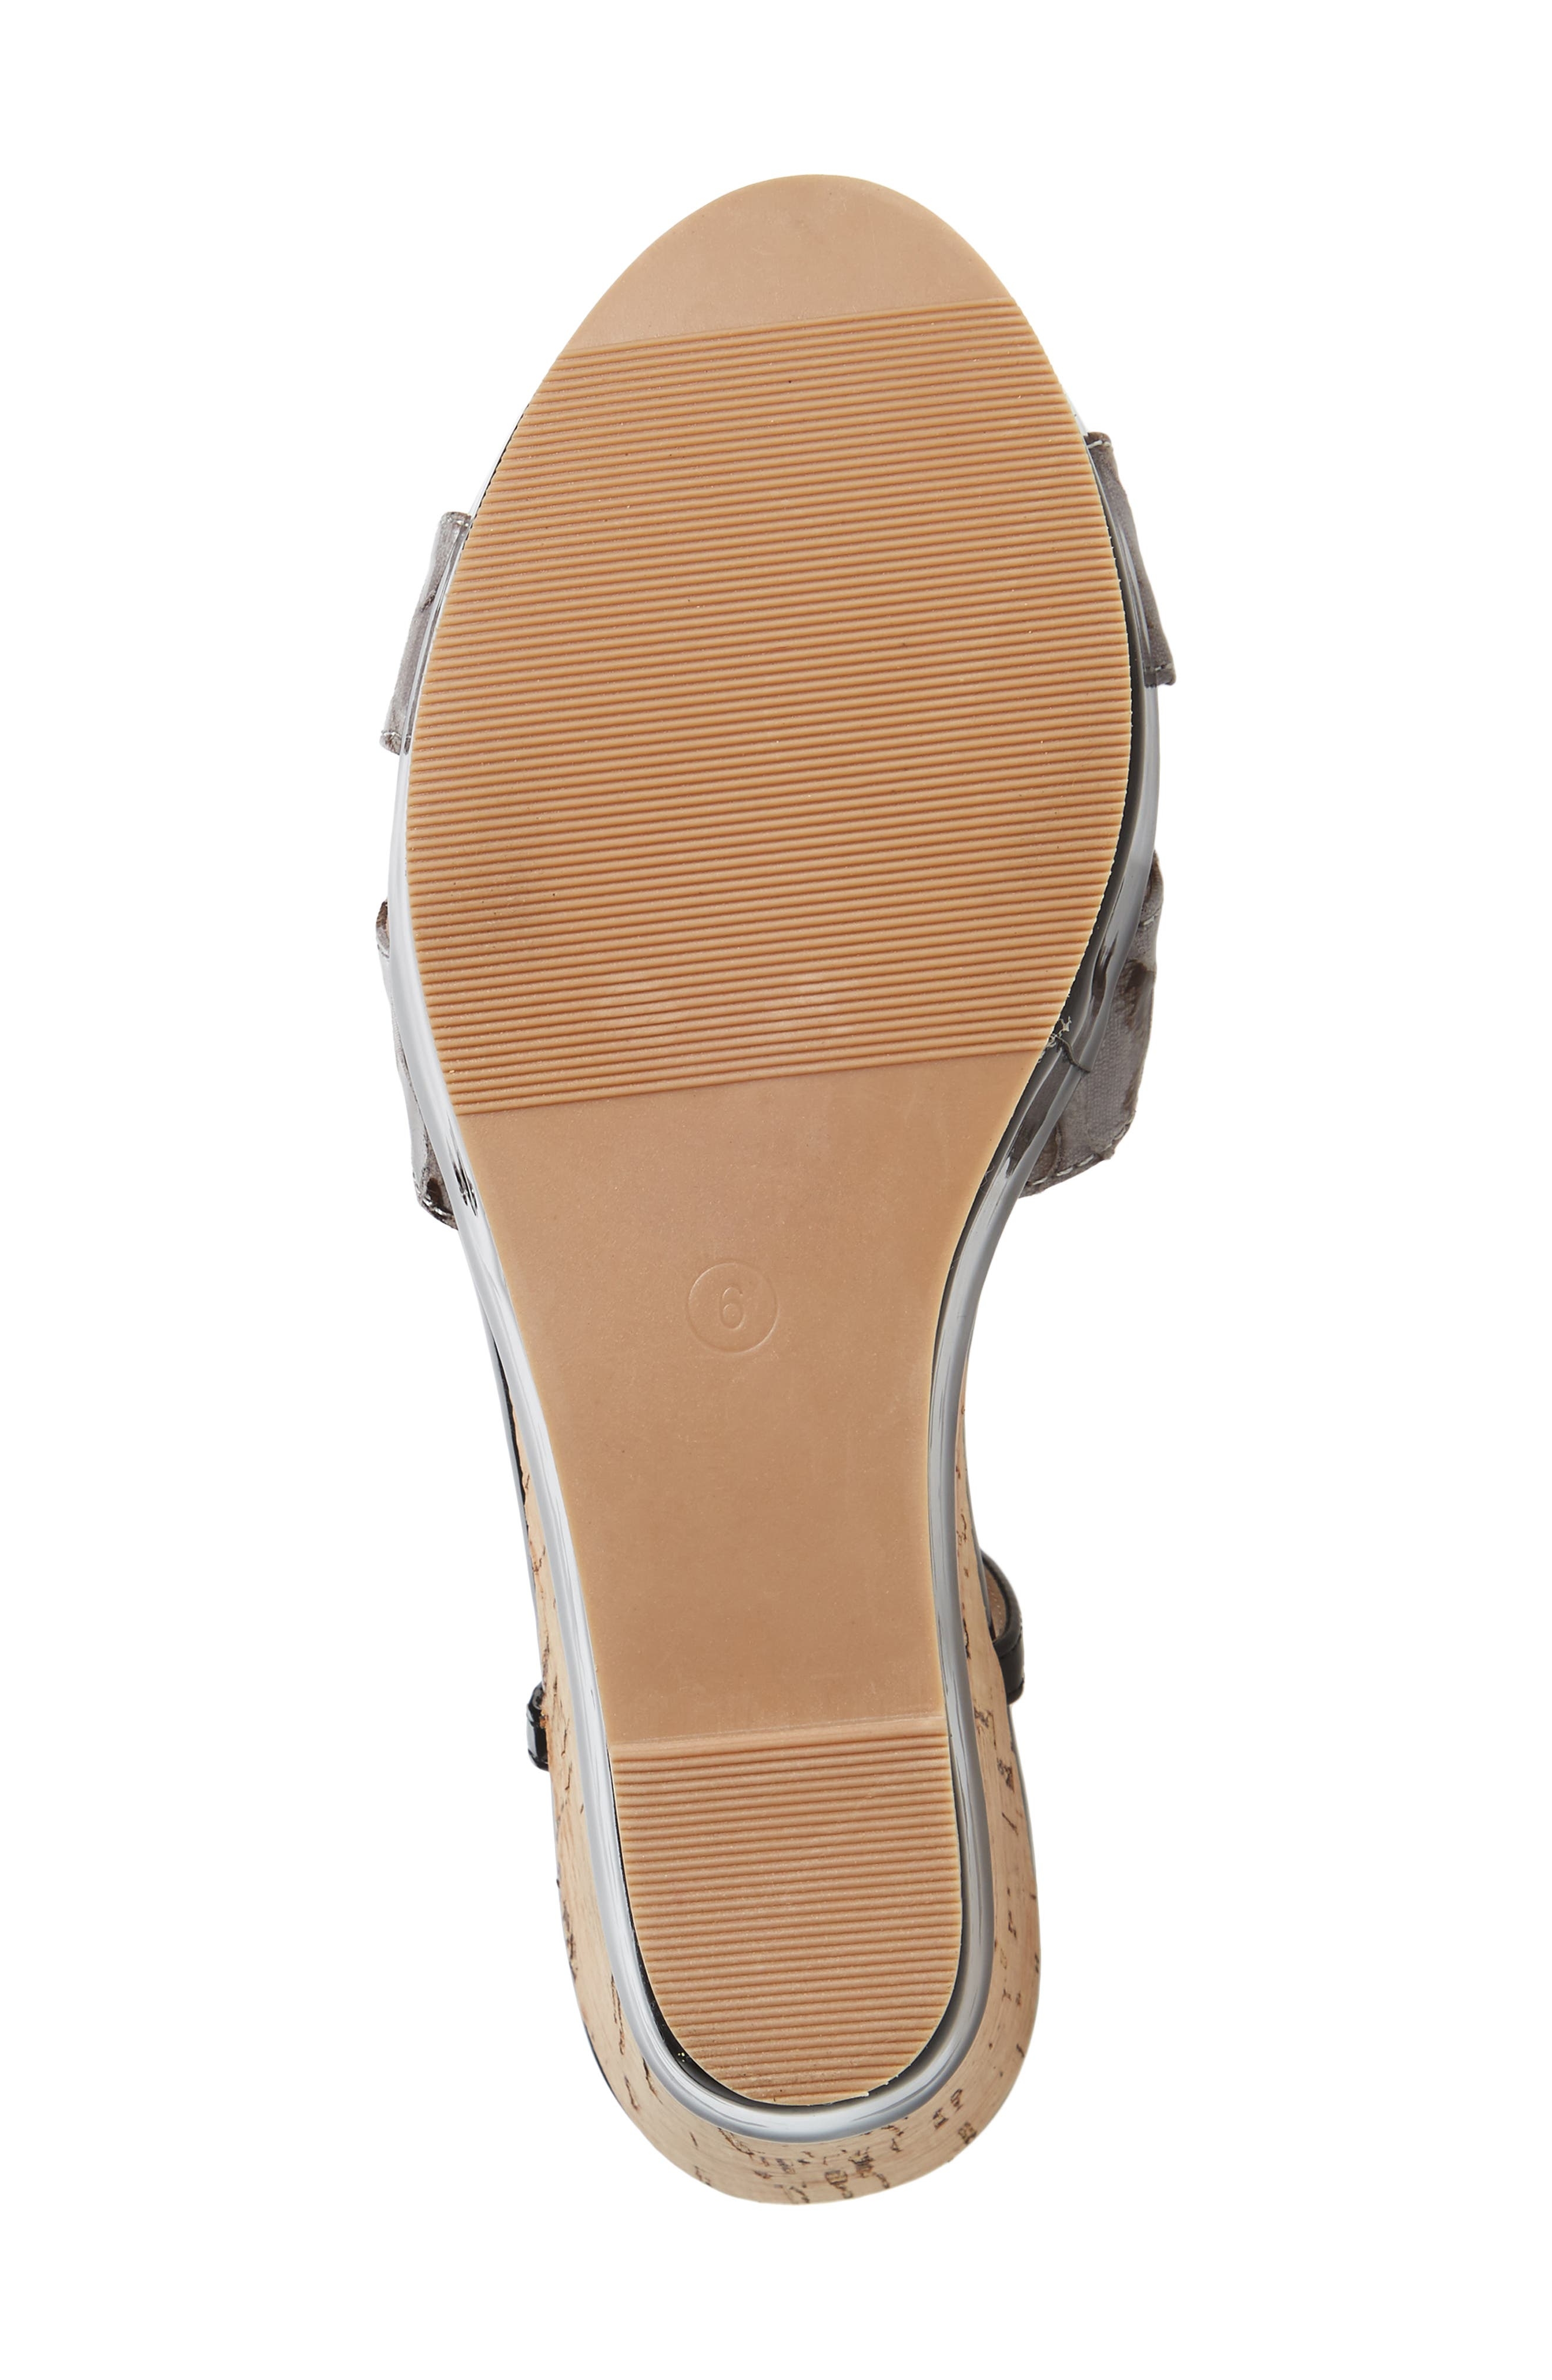 Lottie Platform Wedge Sandal,                             Alternate thumbnail 6, color,                             001